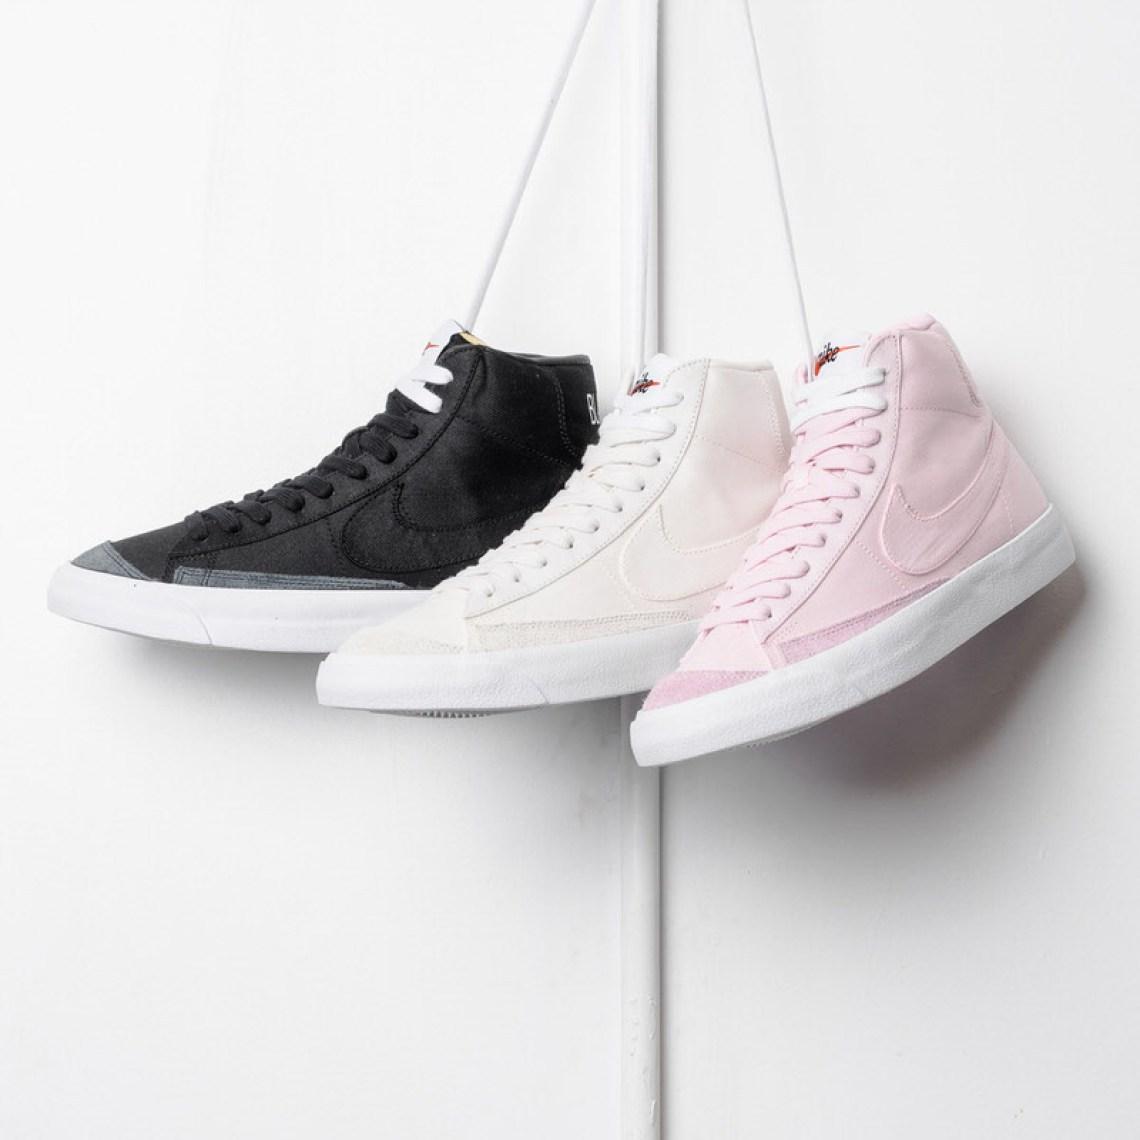 10499f716936 The Nike Blazer Mid  77 VNTG is Back in True Retro Fashion